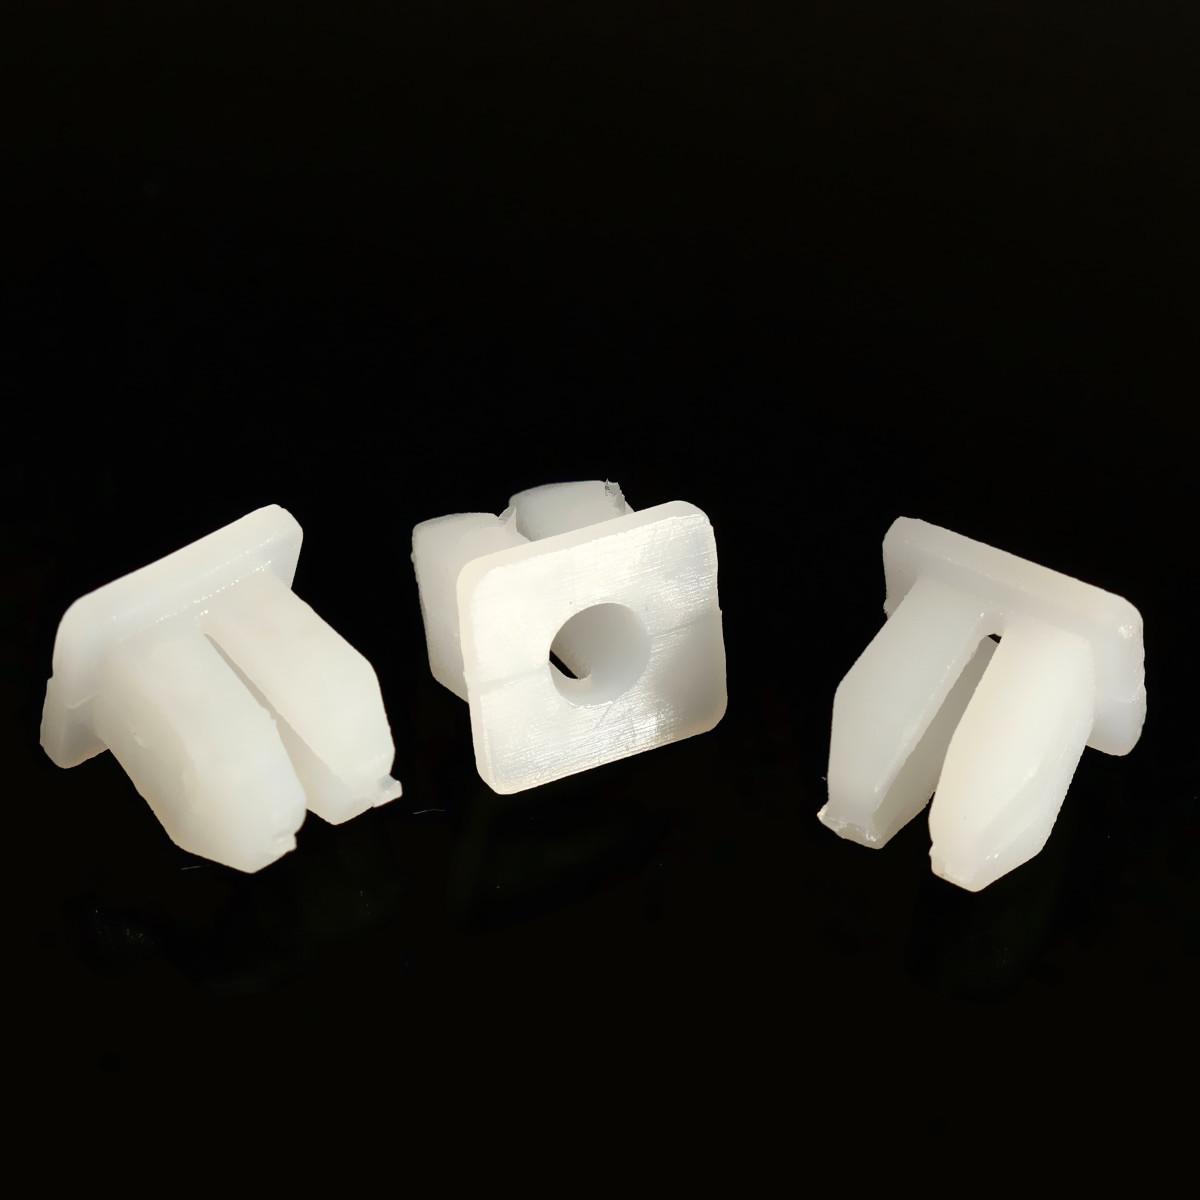 100 pcs Car White Plastic Rivets Fastener Fender Bumper Clips 5mm Hole